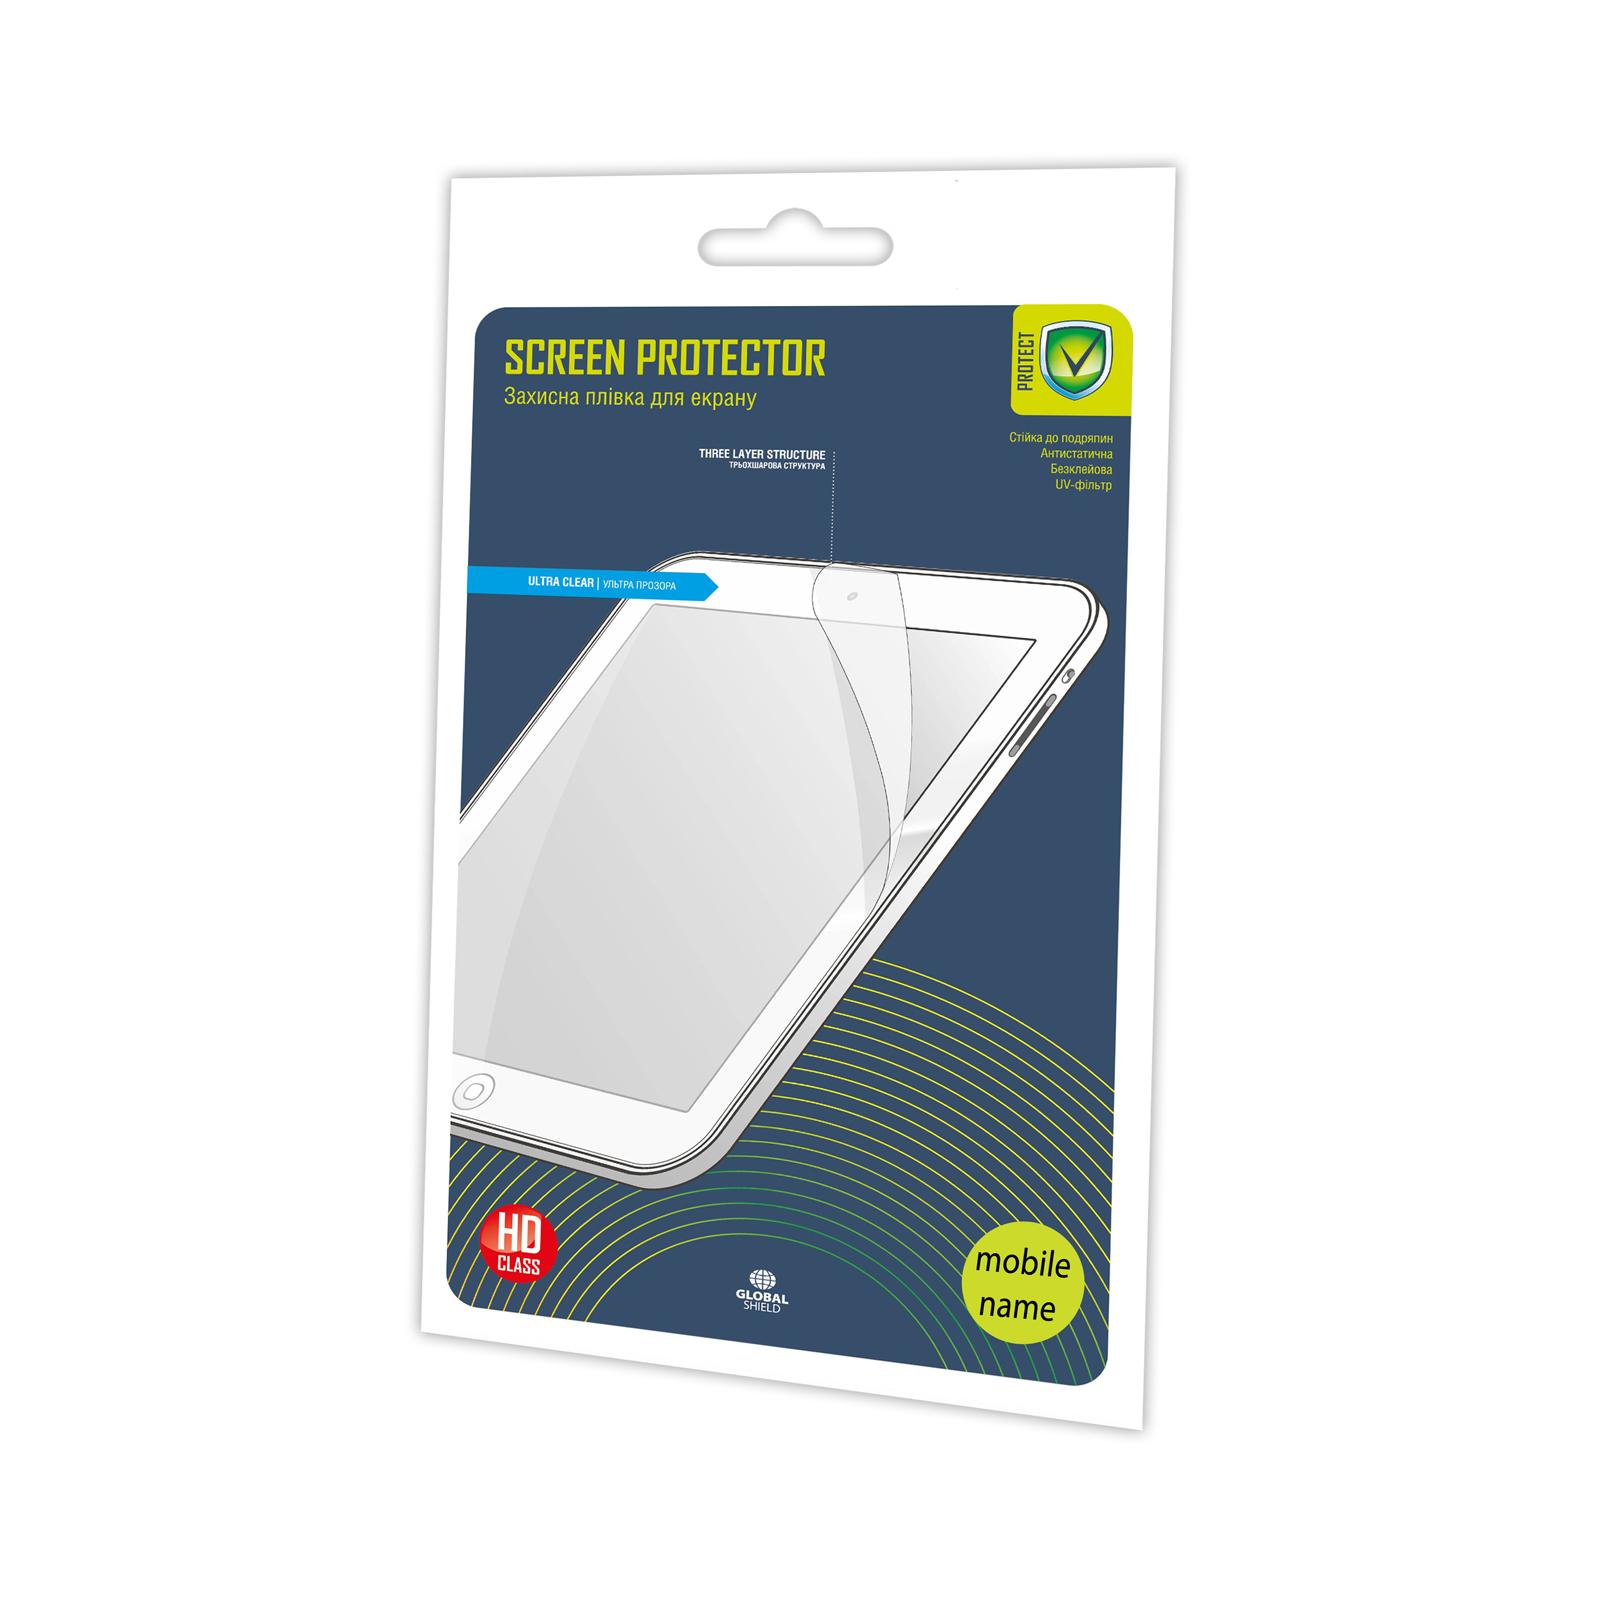 Пленка защитная GLOBAL Samsung T1110 Galaxy Tab 3 7.0 Lite (1283126456596)